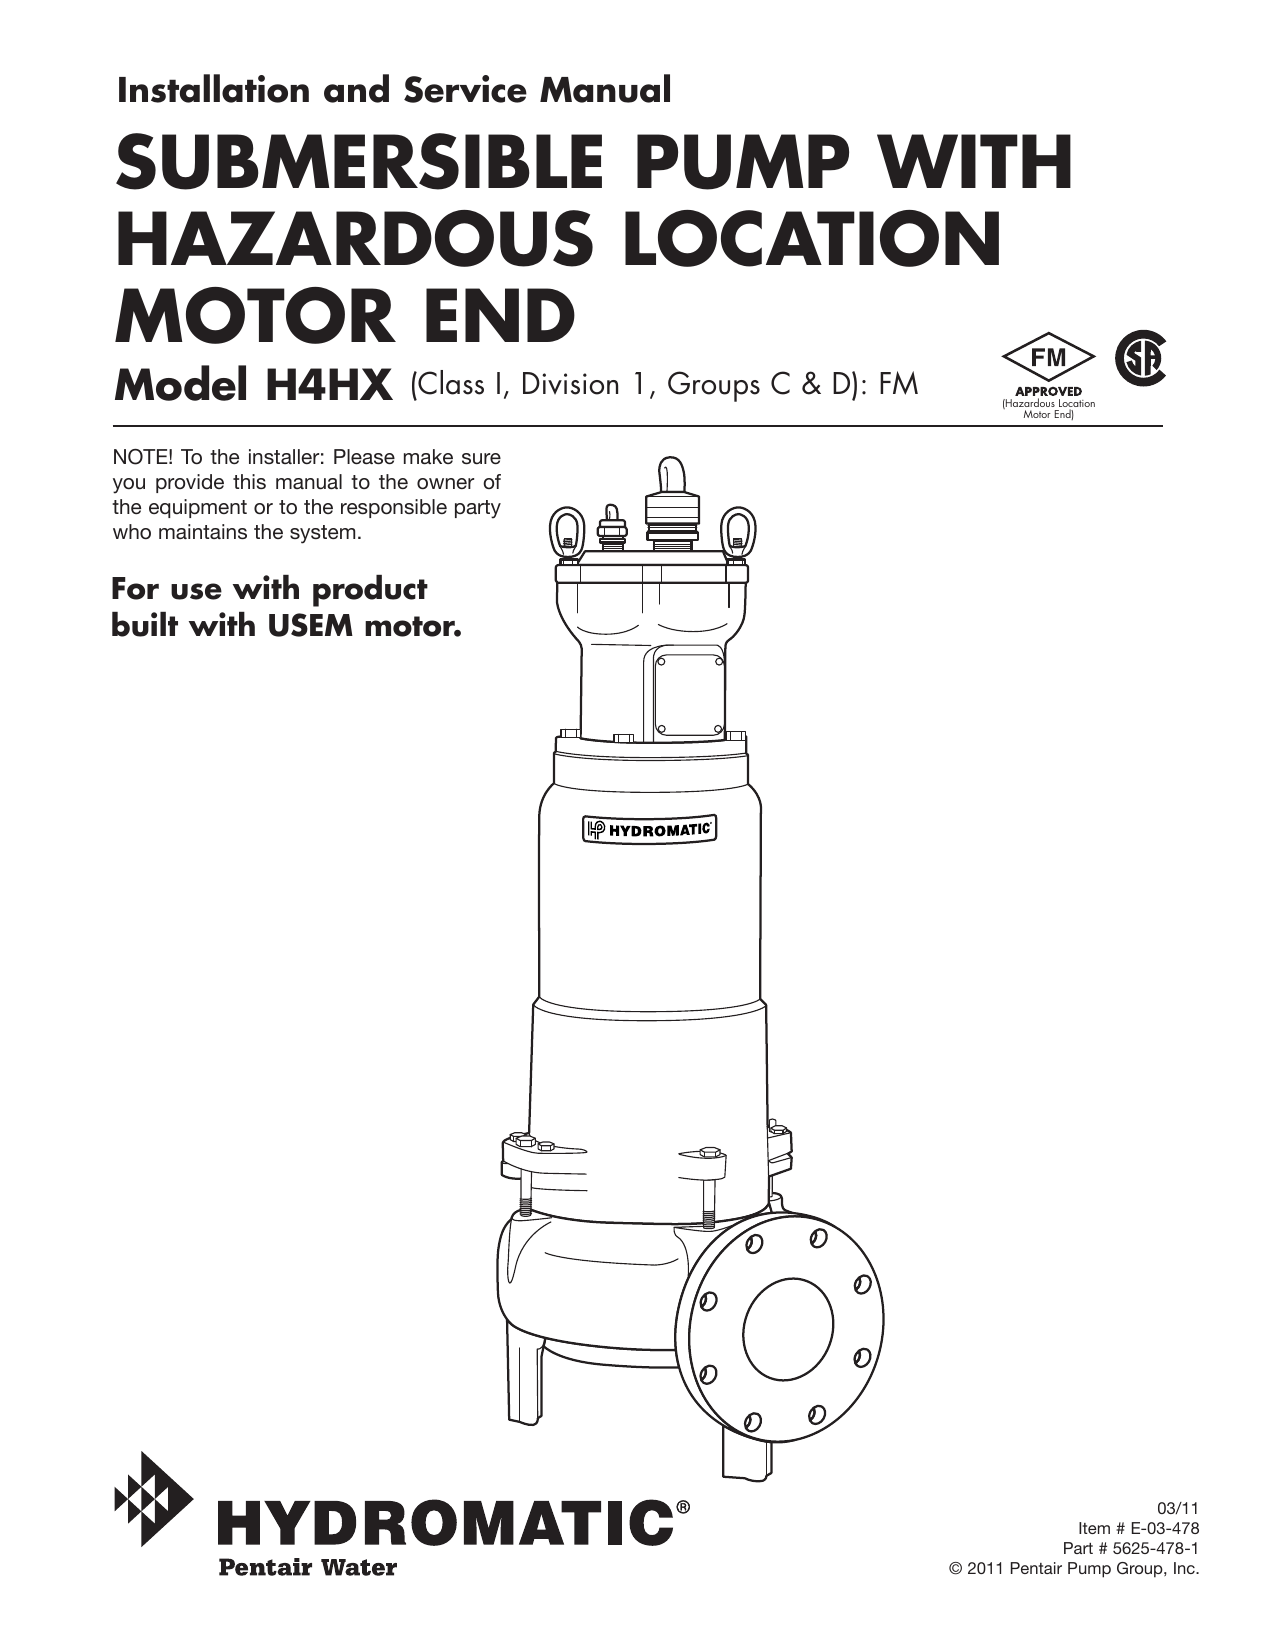 Hydromatic Pump Wiring Diagram - 94 Blazer Wiring Diagram -  air-bag.pujaan-hati.jeanjaures37.fr | Hydromatic Pump Wiring Diagram |  | Wiring Diagram Resource